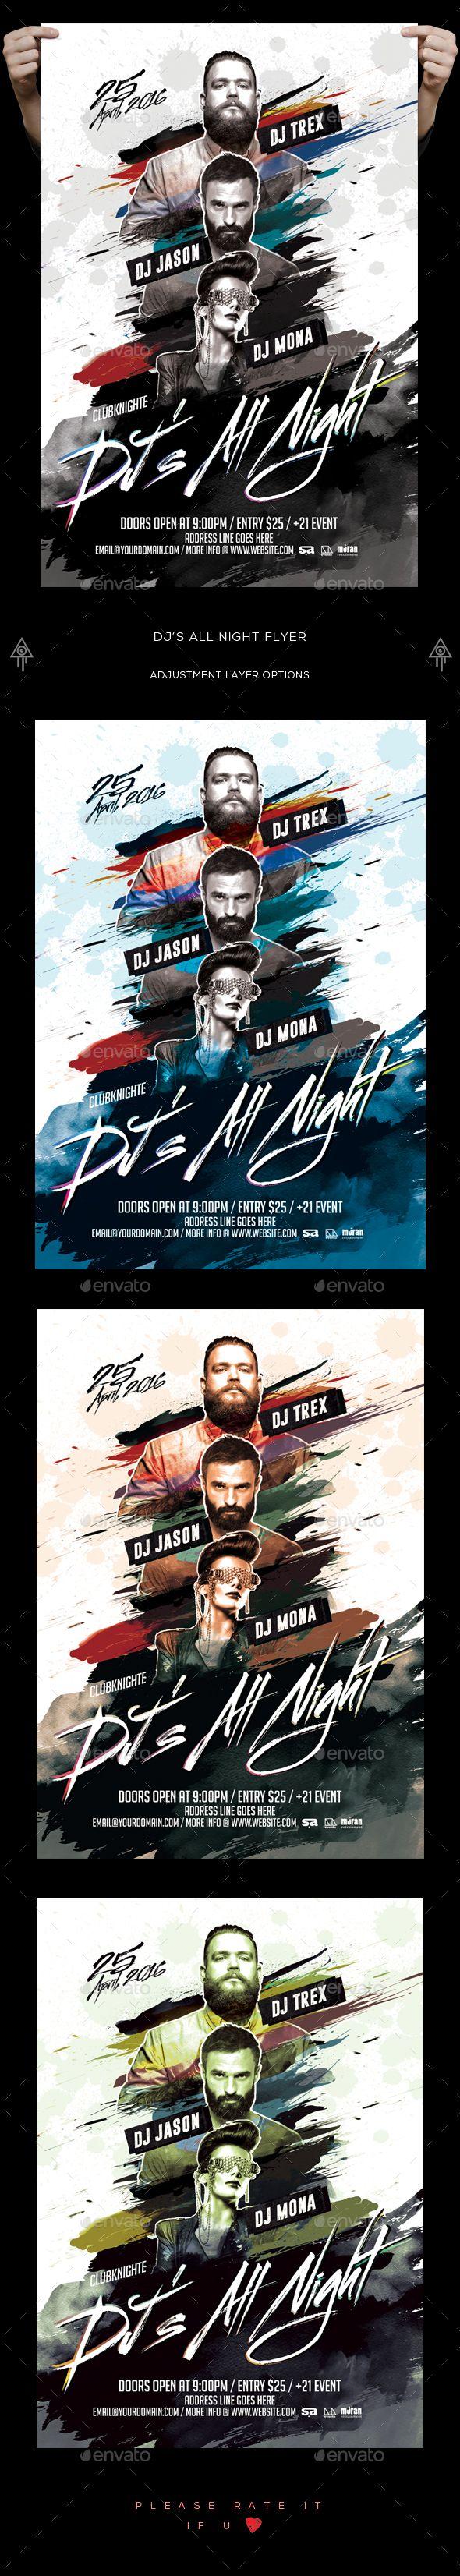 Dj's All Night Flyer